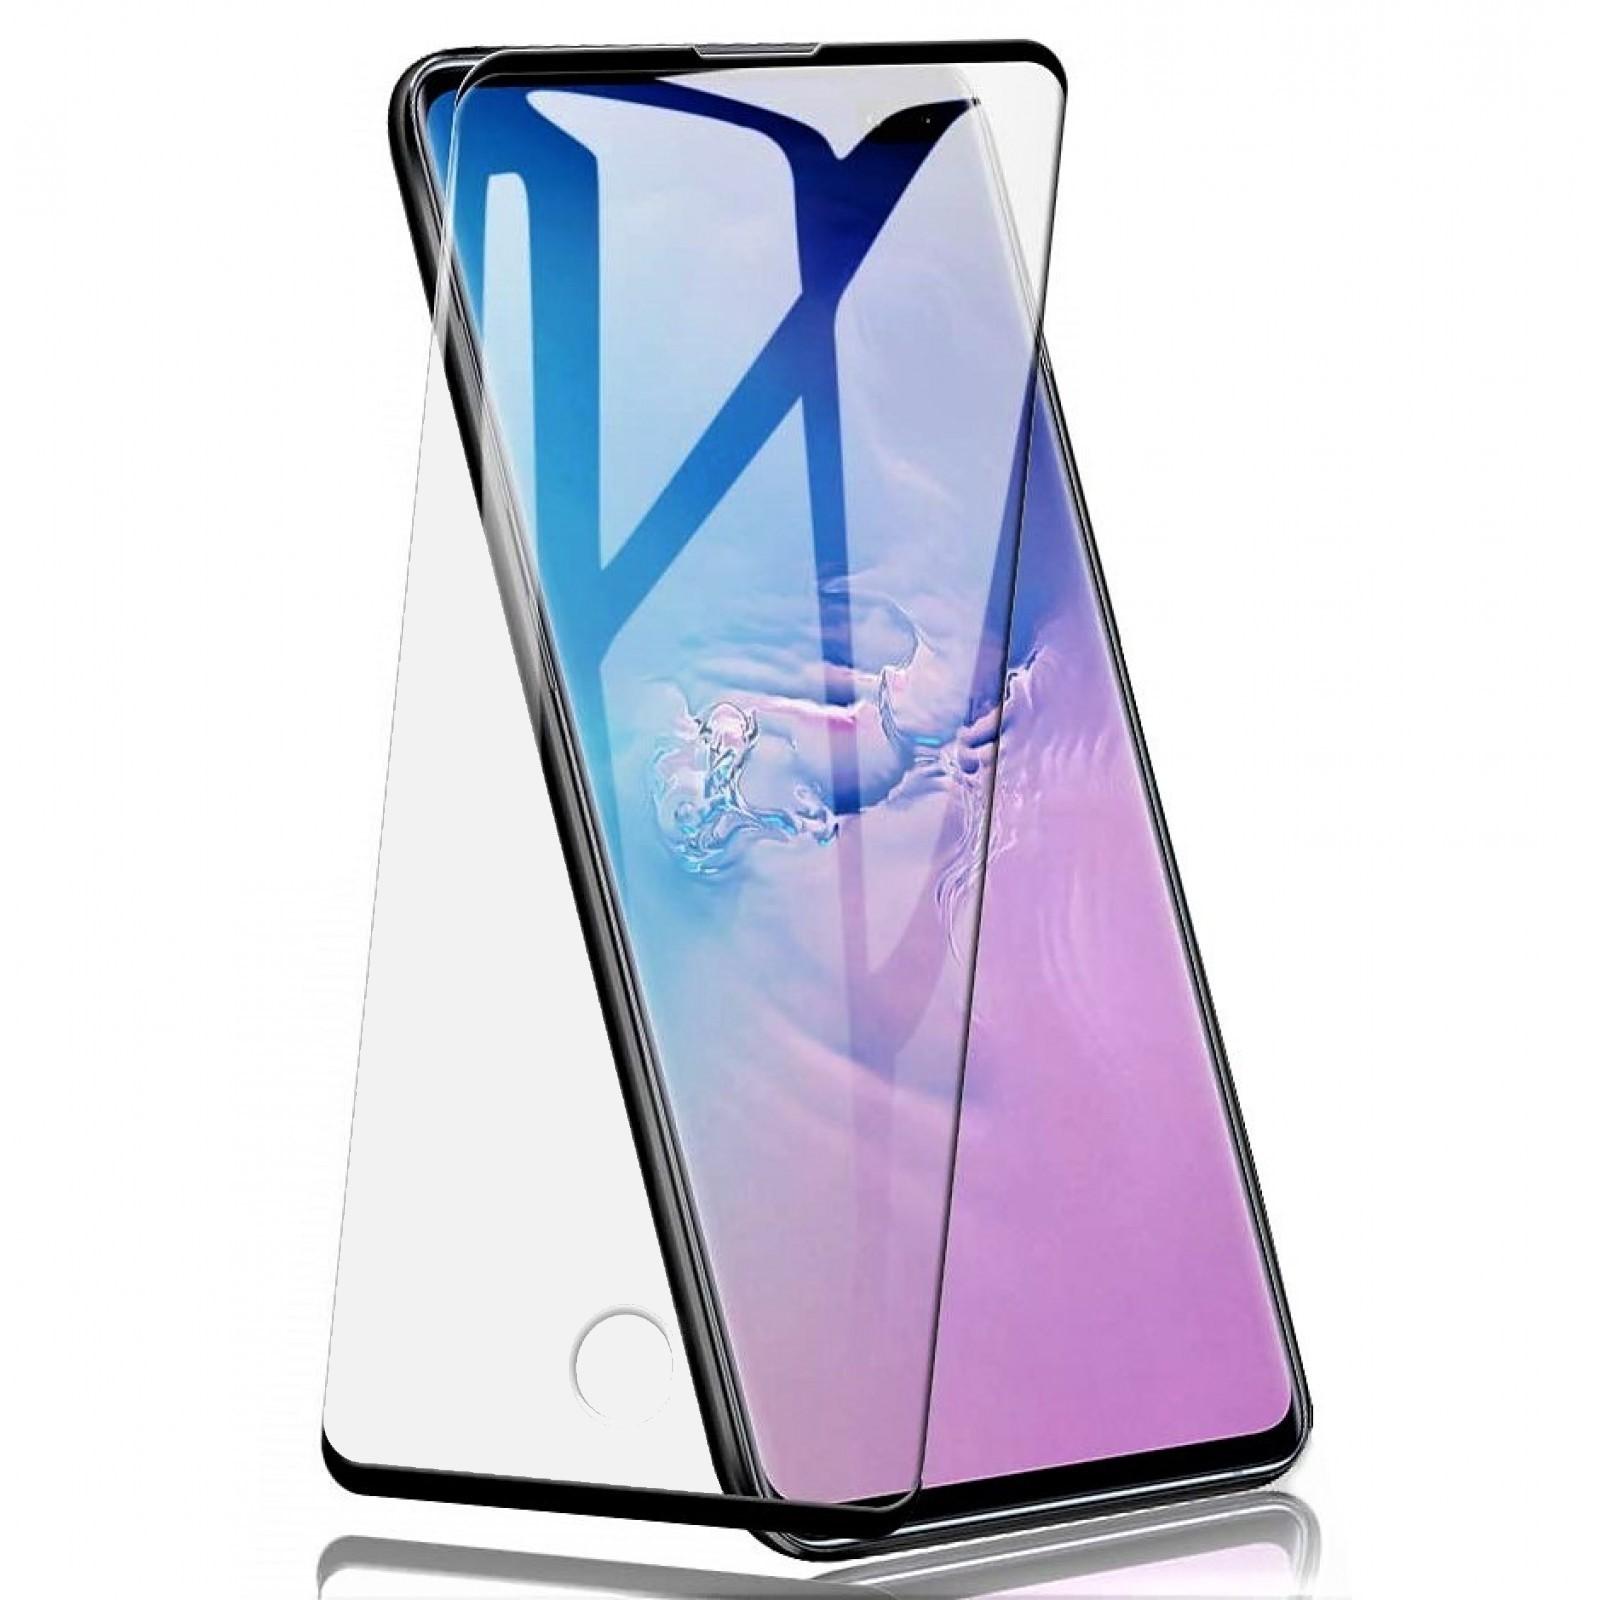 Folie de Sticla Tempered Glass Case Friendly 3D Curbata NEGRU Samsung S10 5G